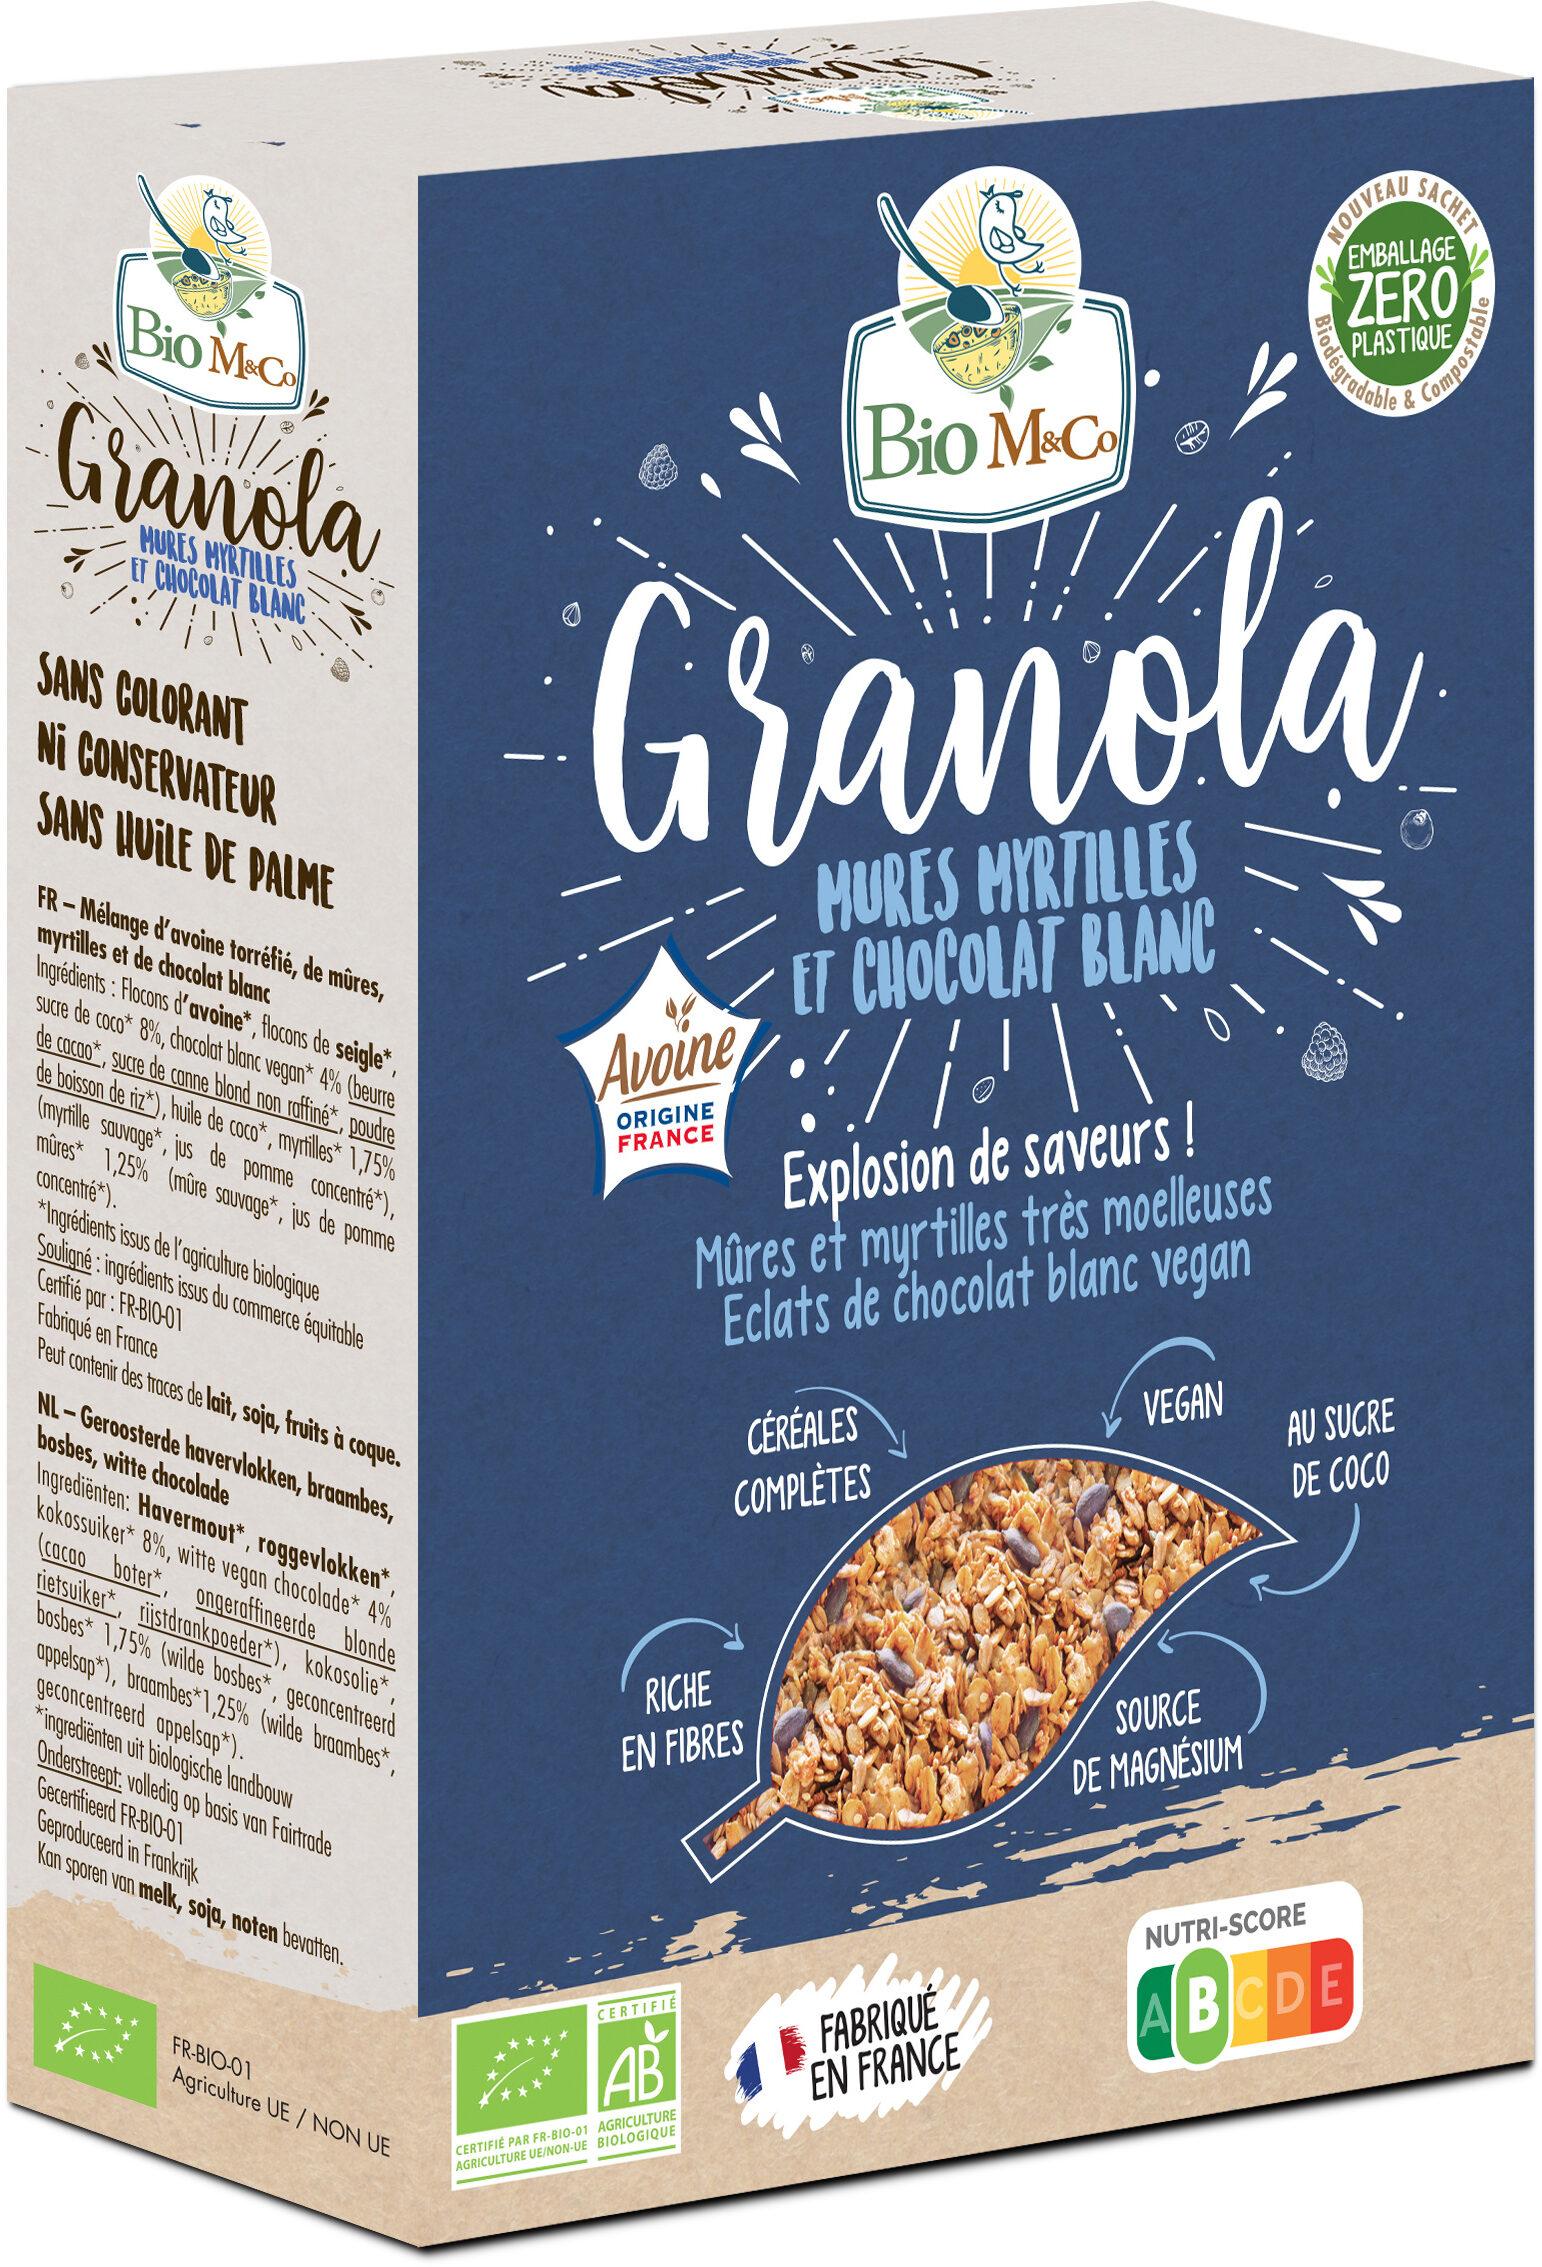 Granola Mûres Myrtilles et Chocolat Blanc - Produit - fr